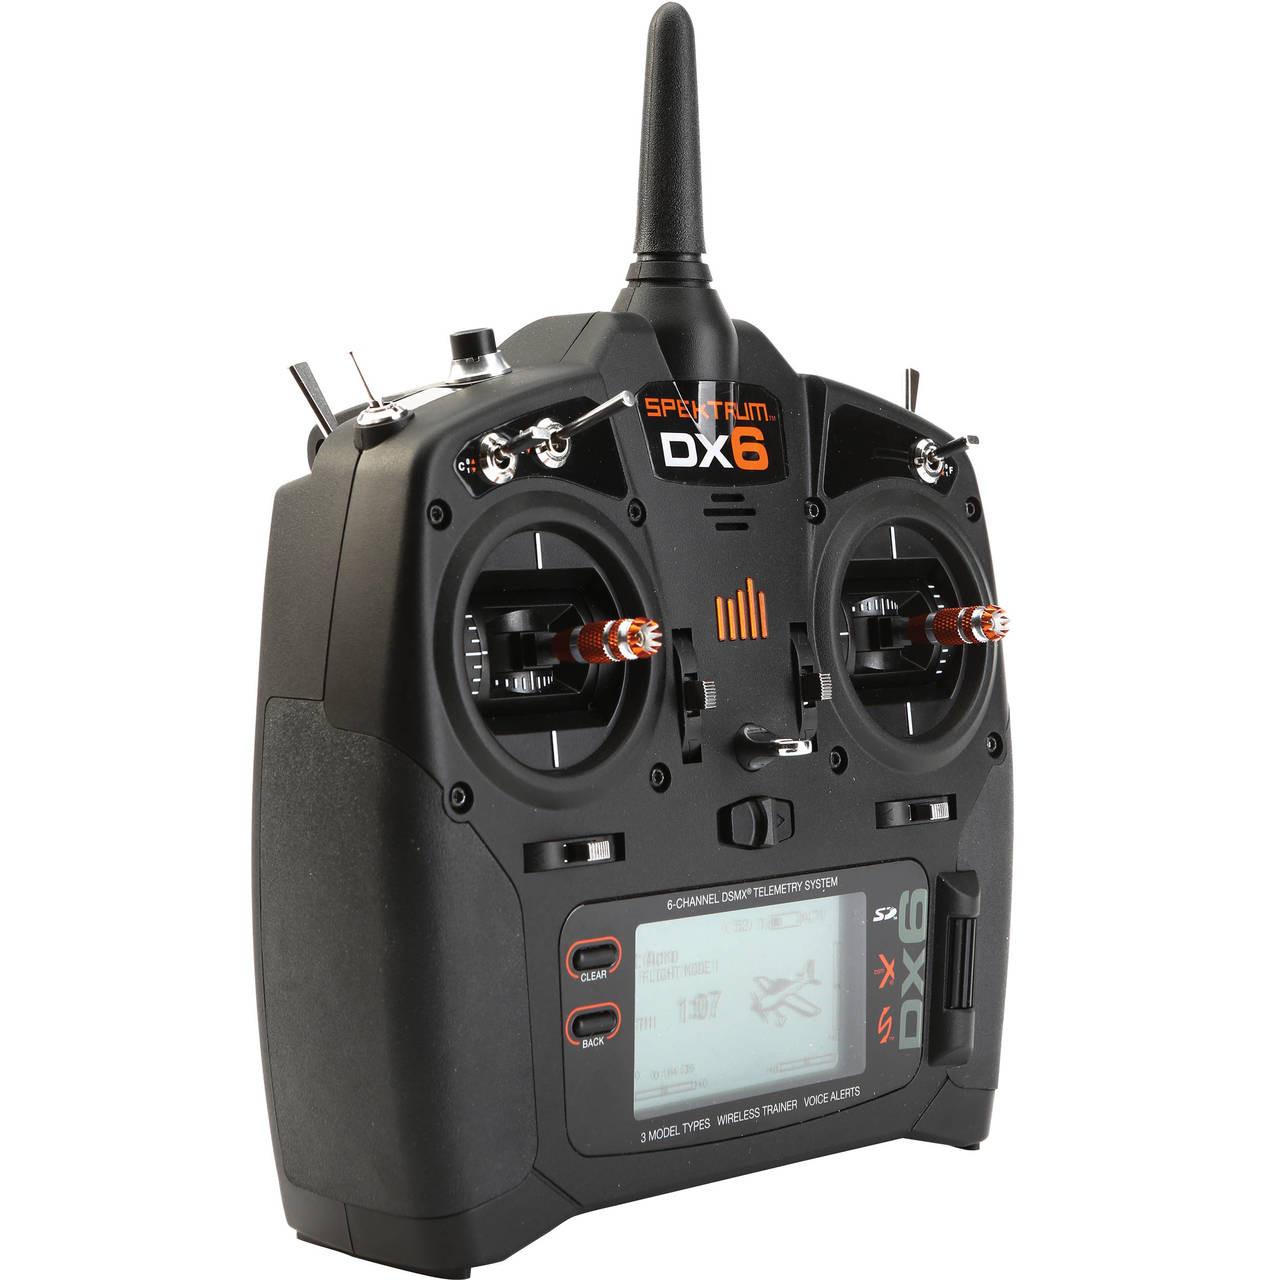 Spektrum SPM6700 DX6 6-Ch DSMX Transmitter W/AR610 Rx - Hobby Station